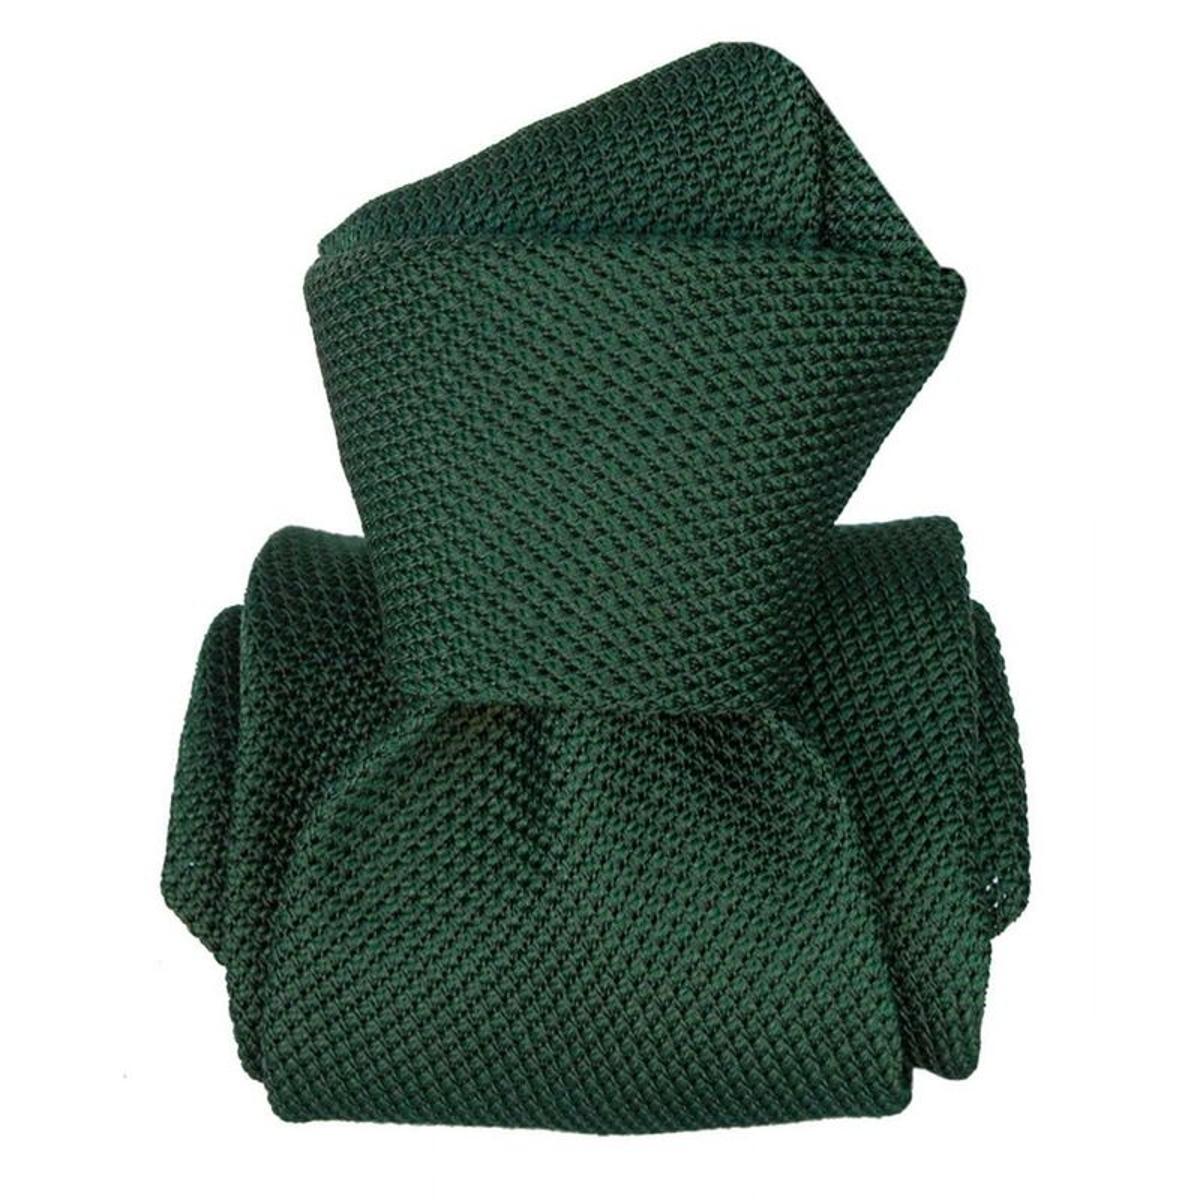 Cravate grenadine de soie soie lucia